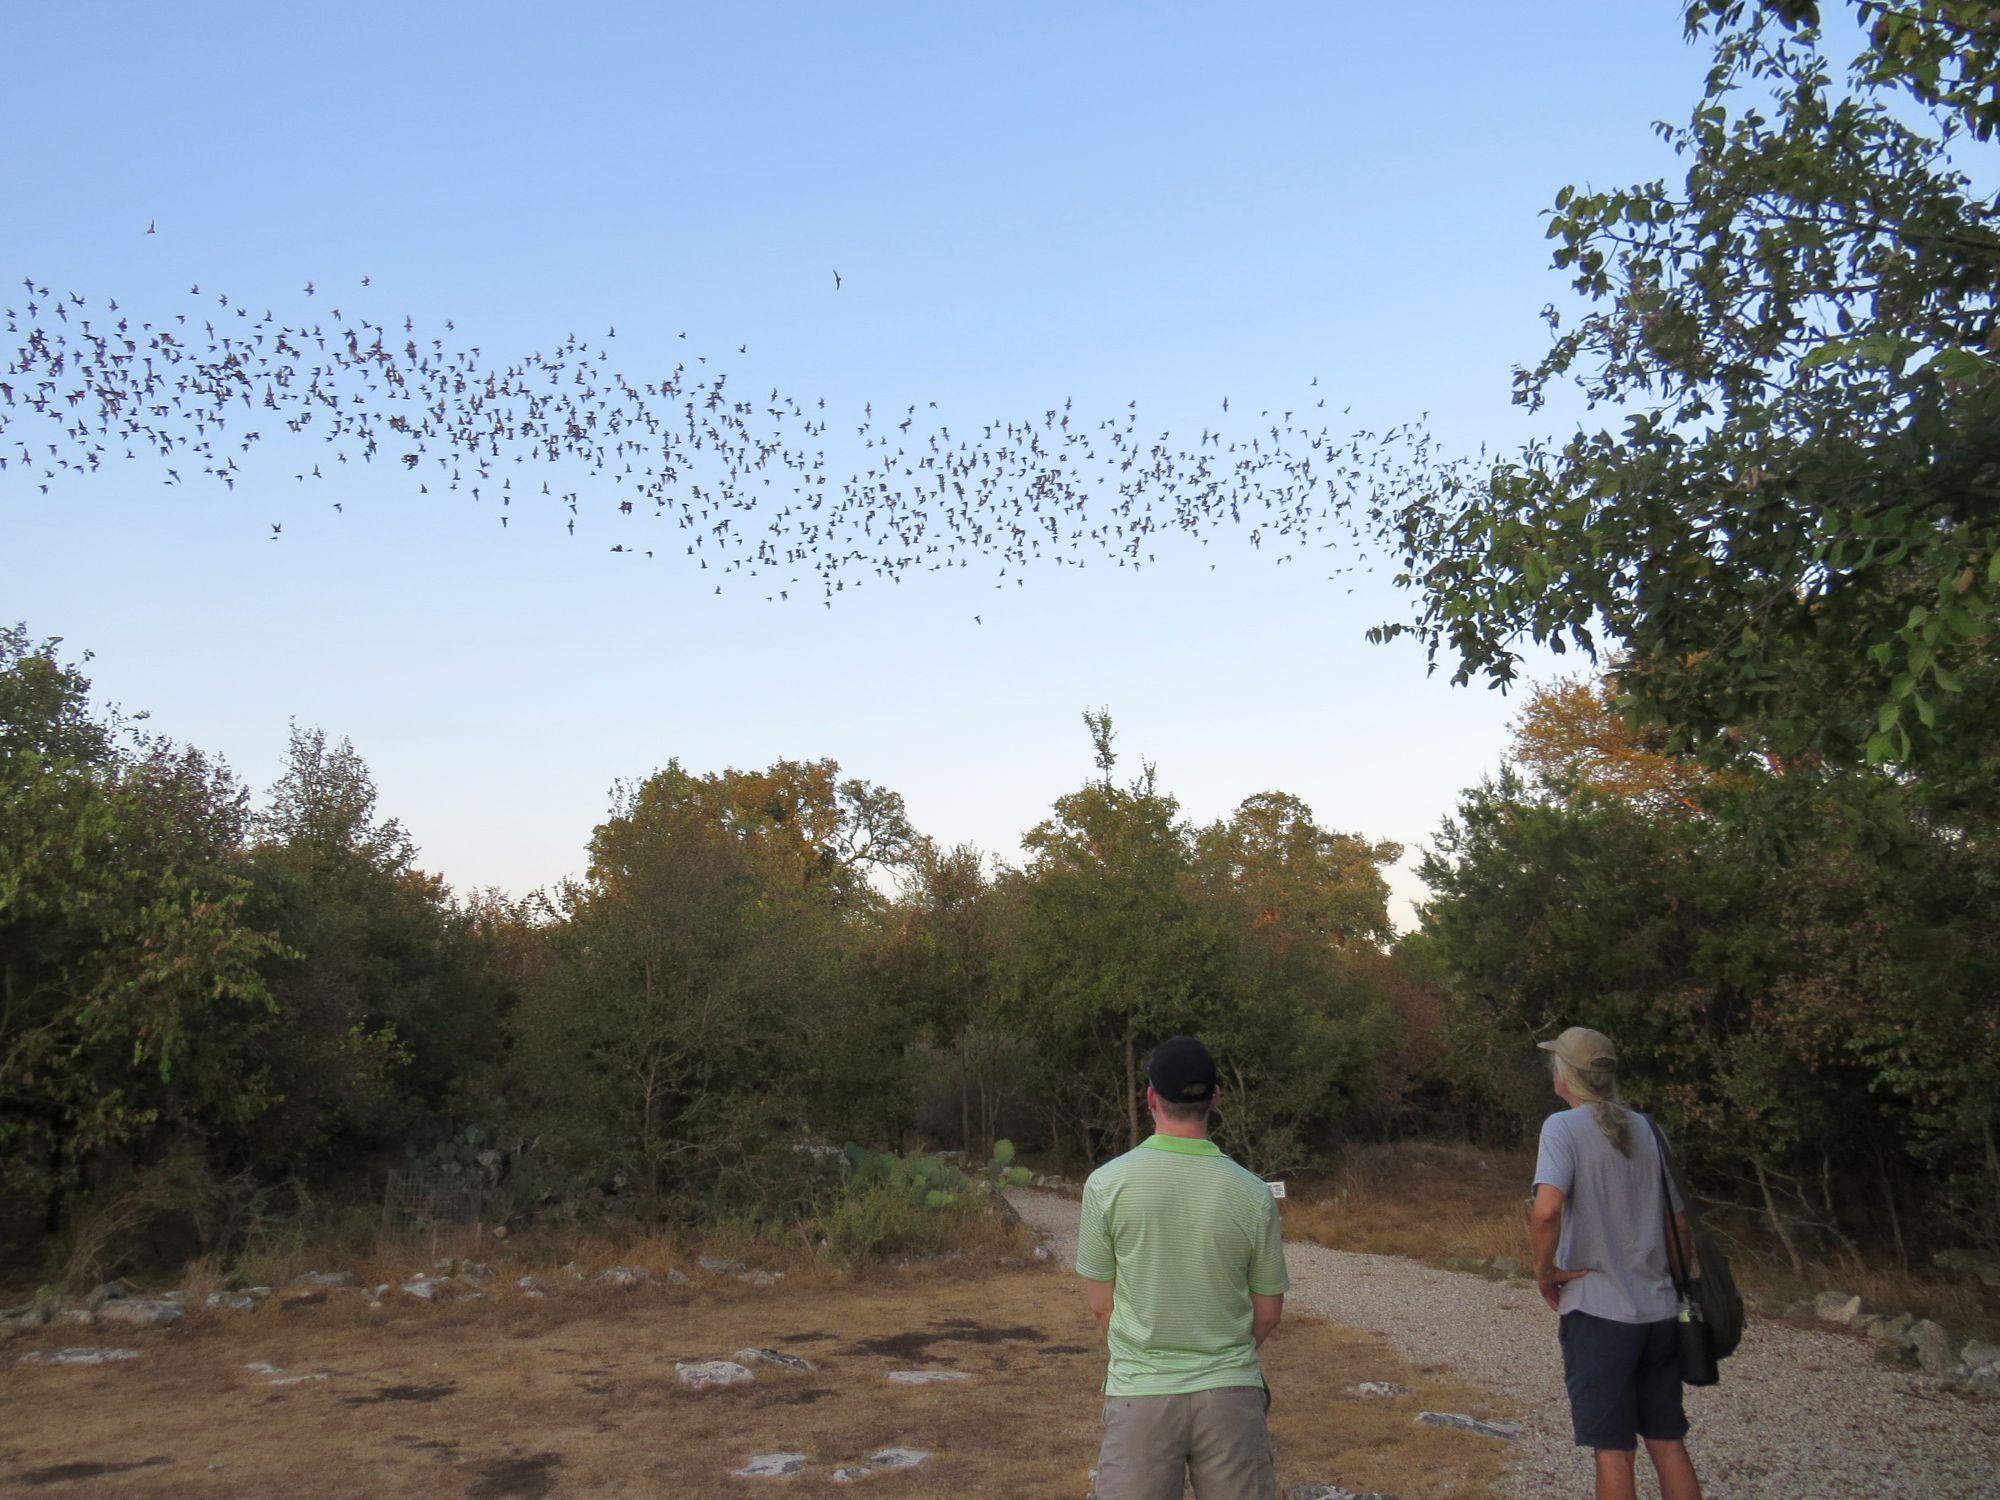 Bats Overhead